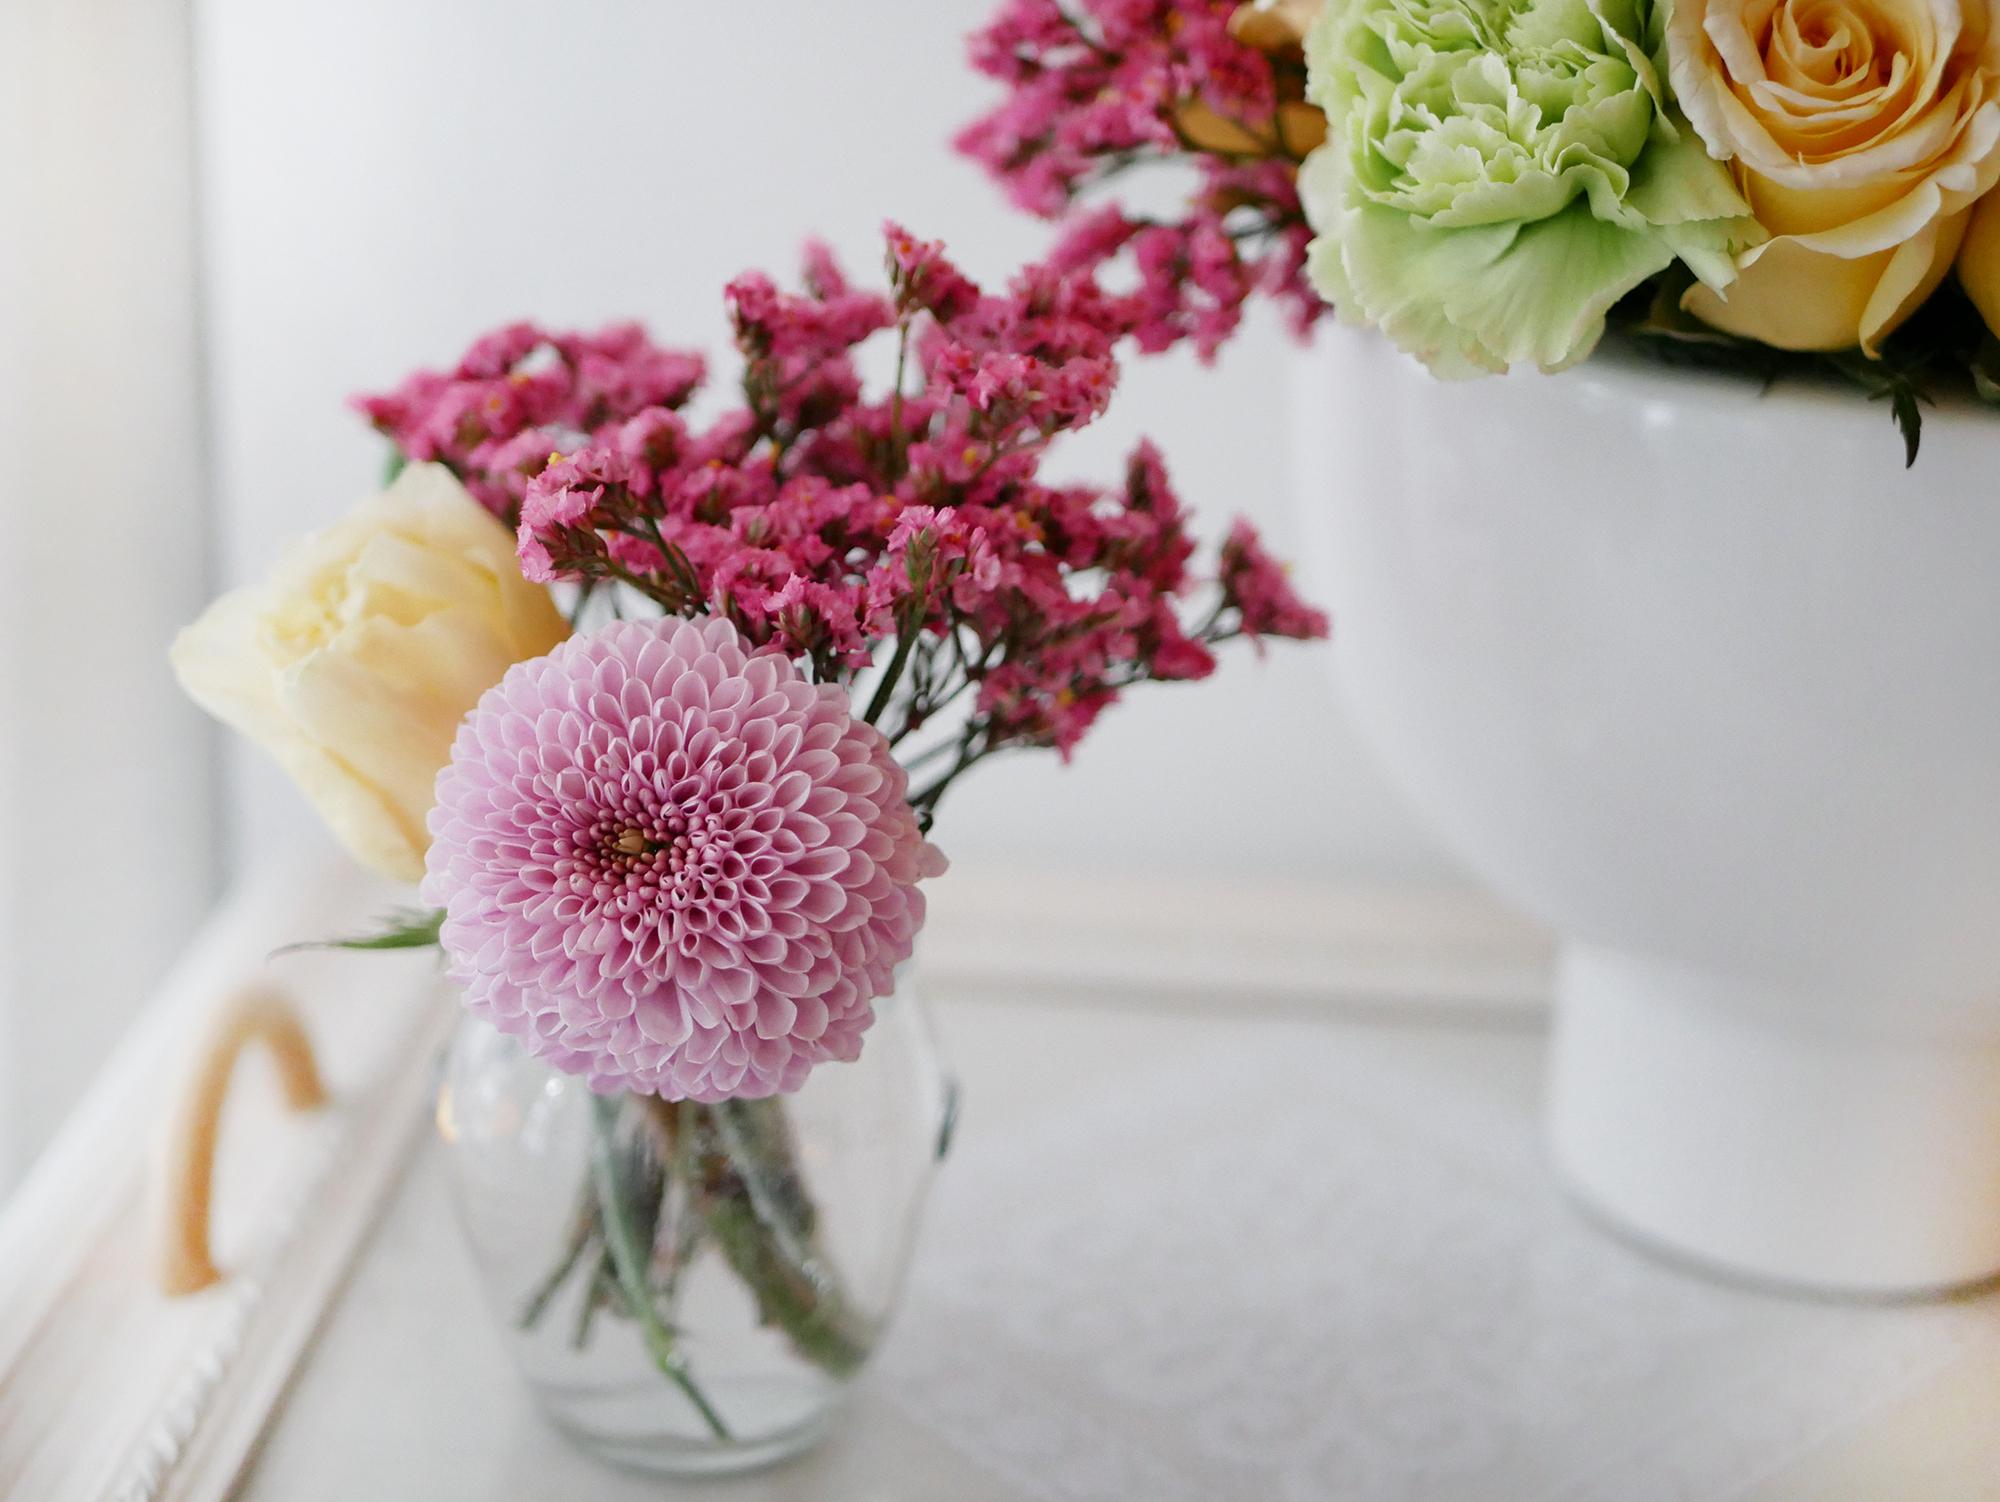 BONITO DESIGN EVENTS EASTER FLOWERS 5.jpg